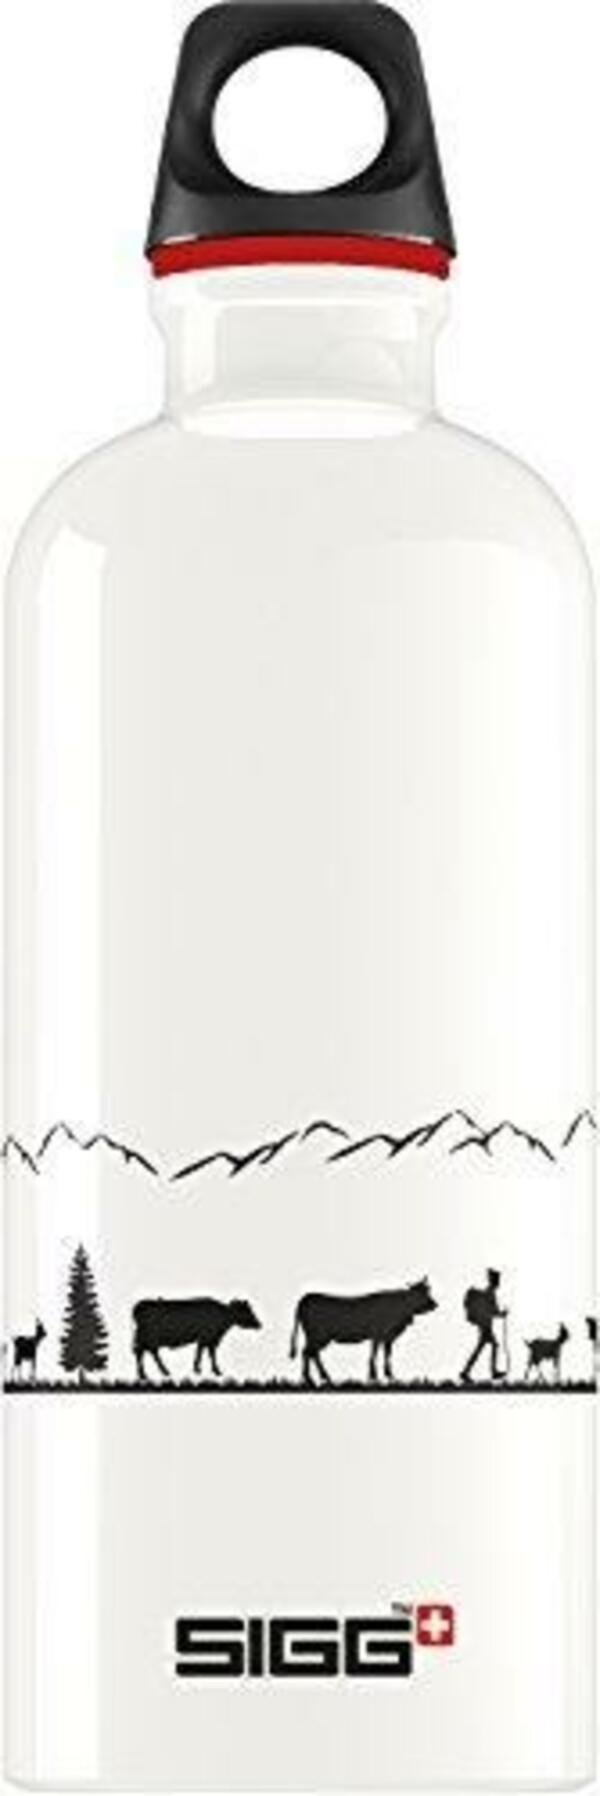 SIGG Trinkflasche Swiss Craft 0.6l